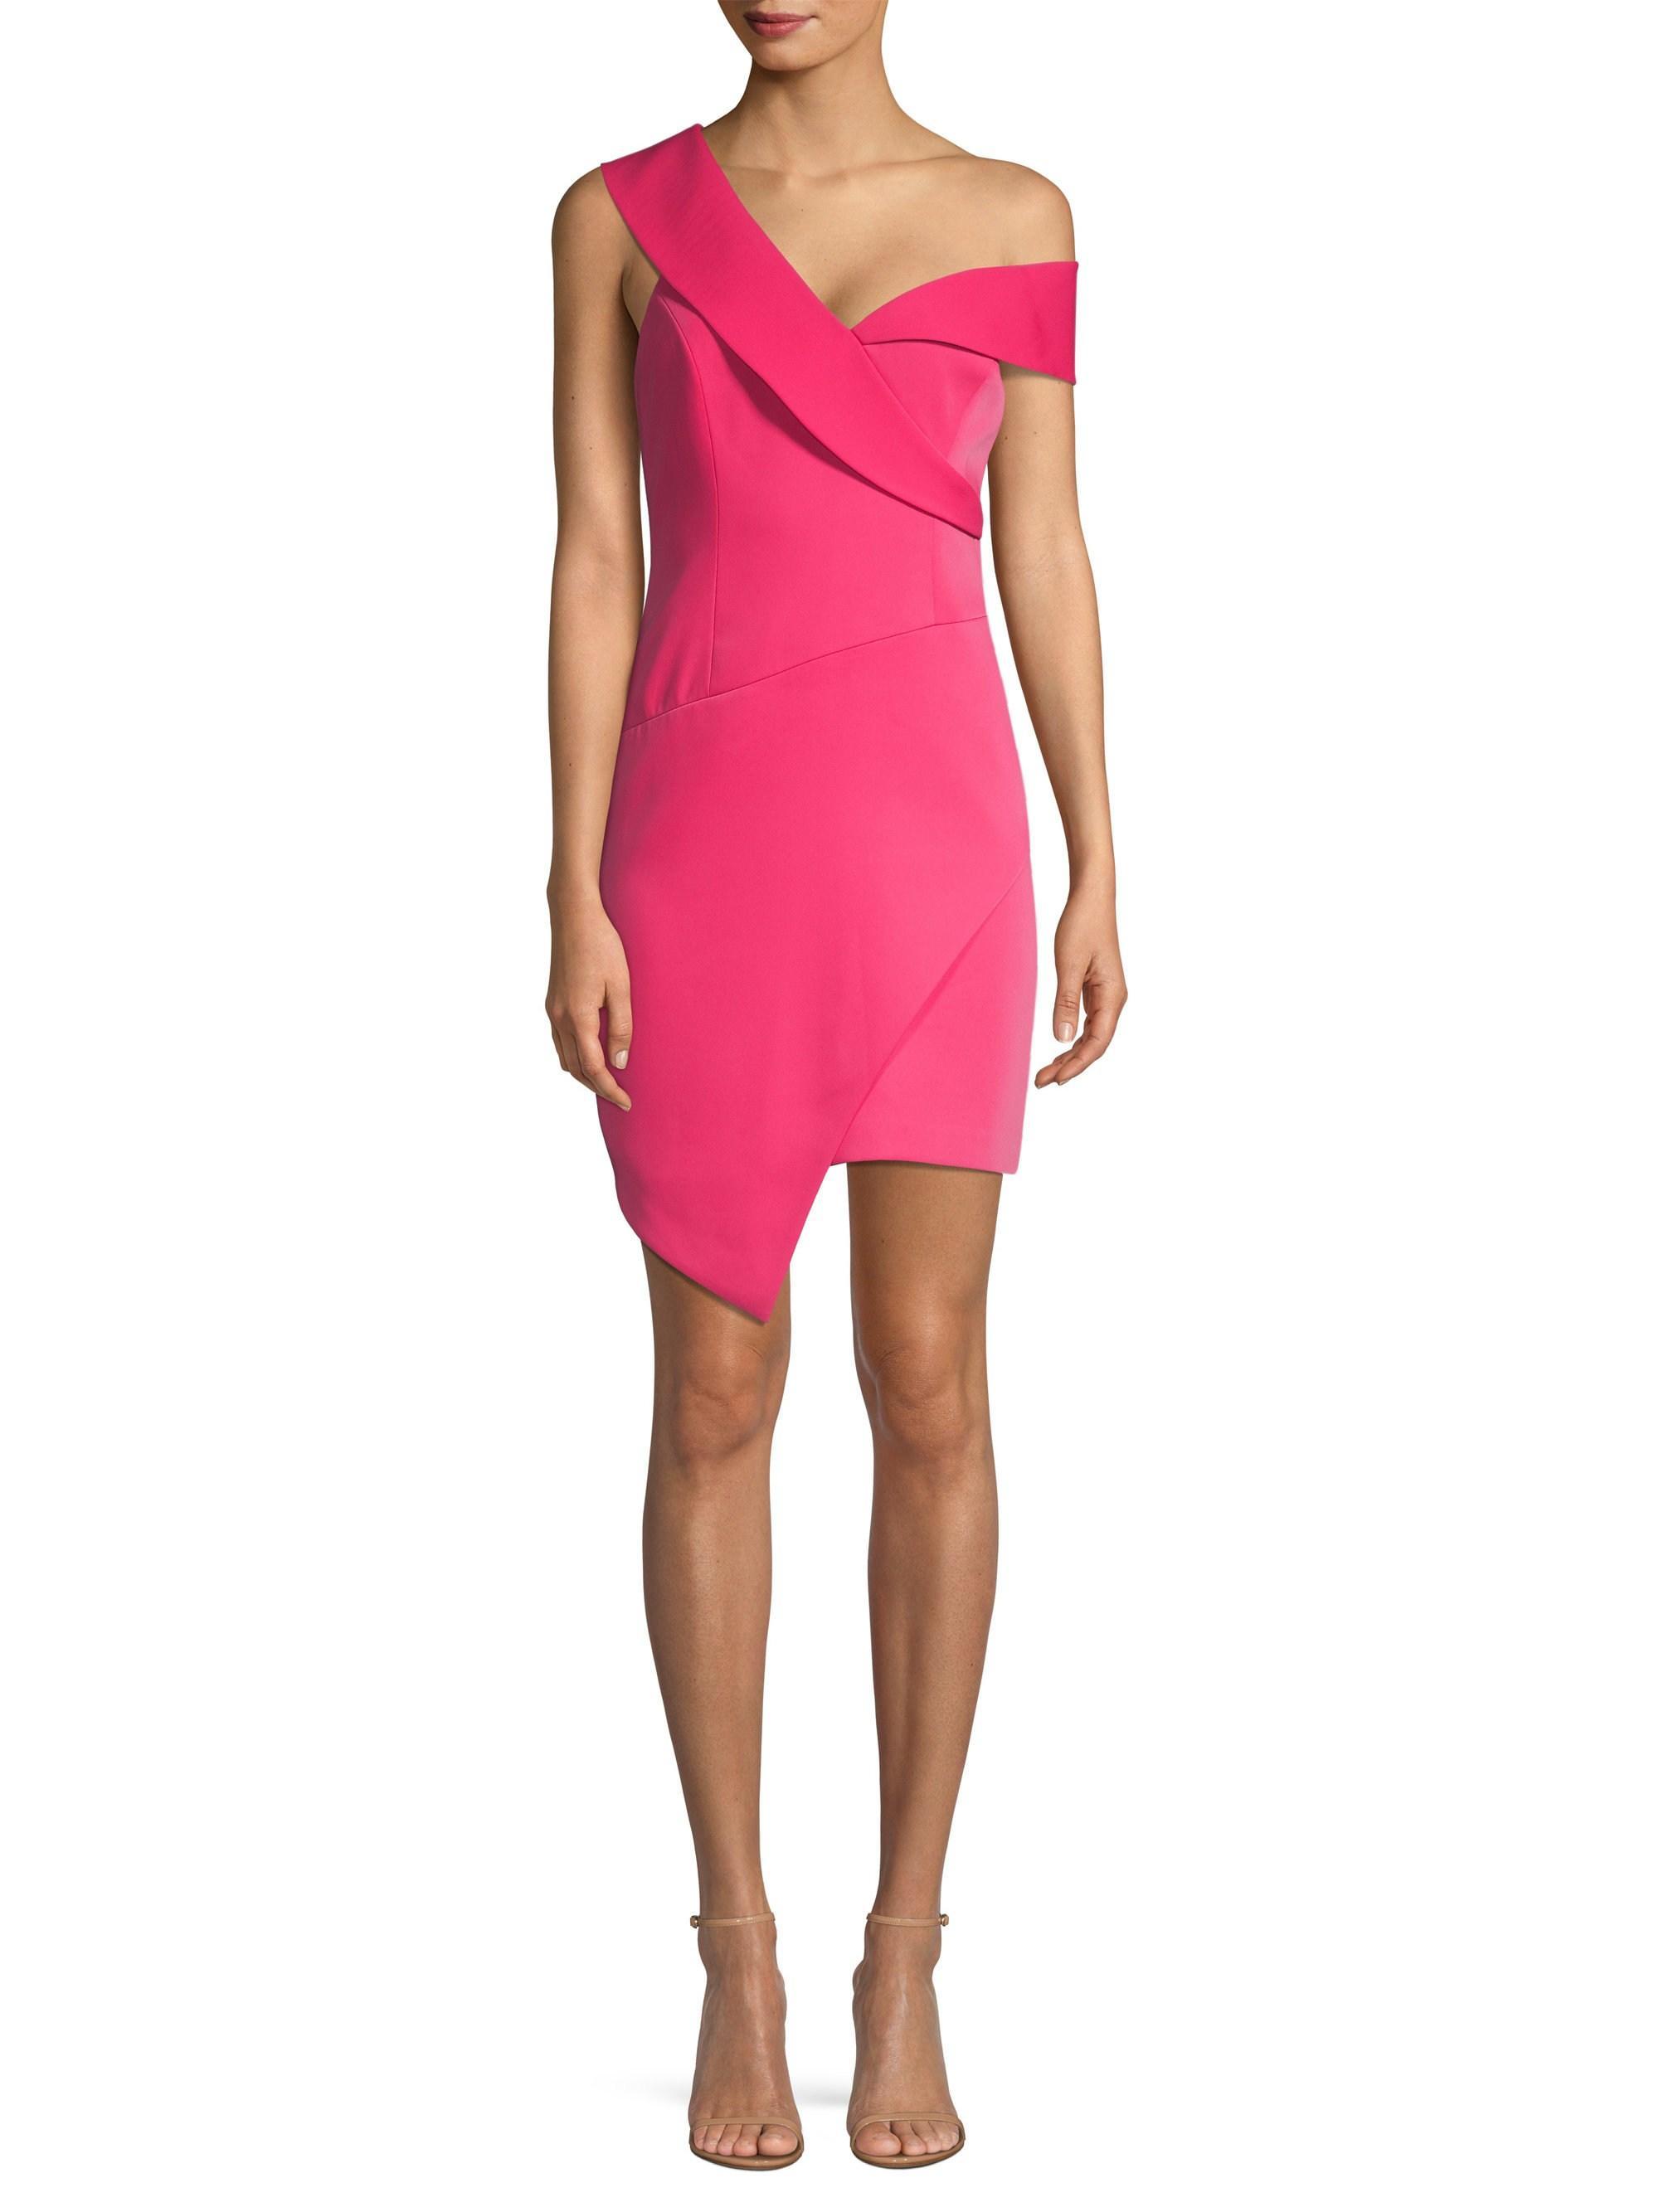 e8761dd2 BCBGMAXAZRIA One Shoulder Satin Sheath Dress in Pink - Lyst